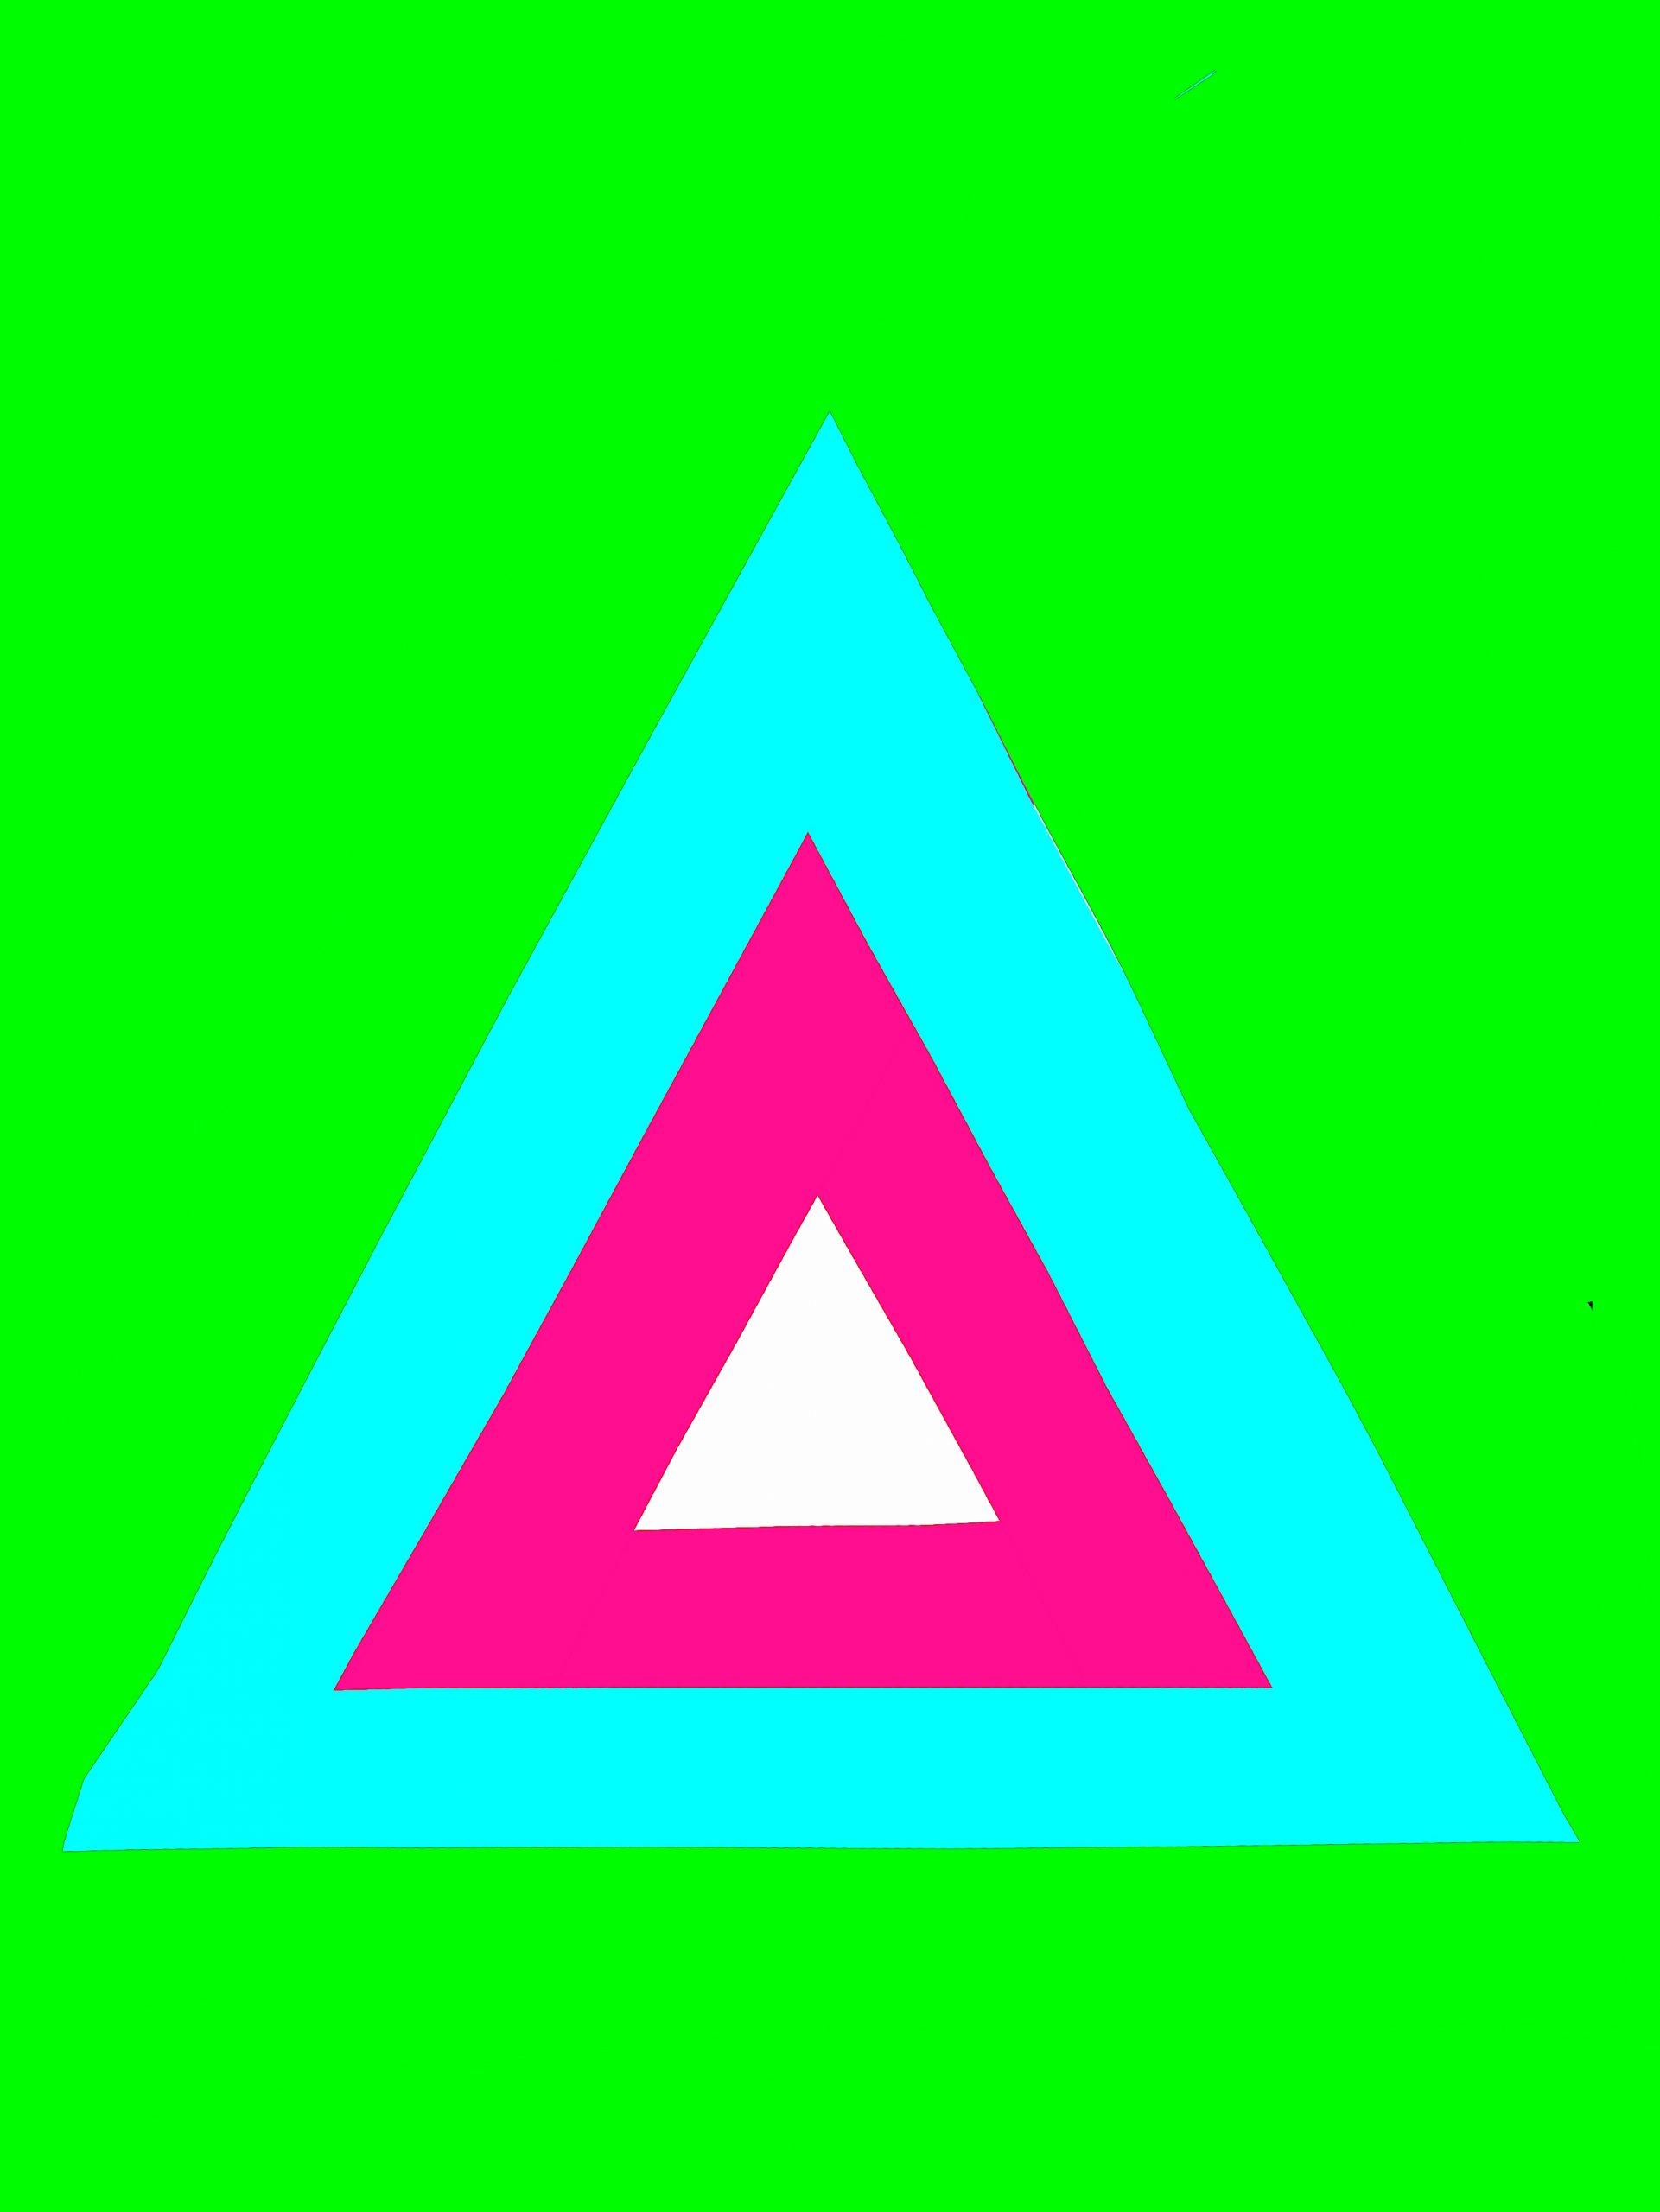 A triangle illustration